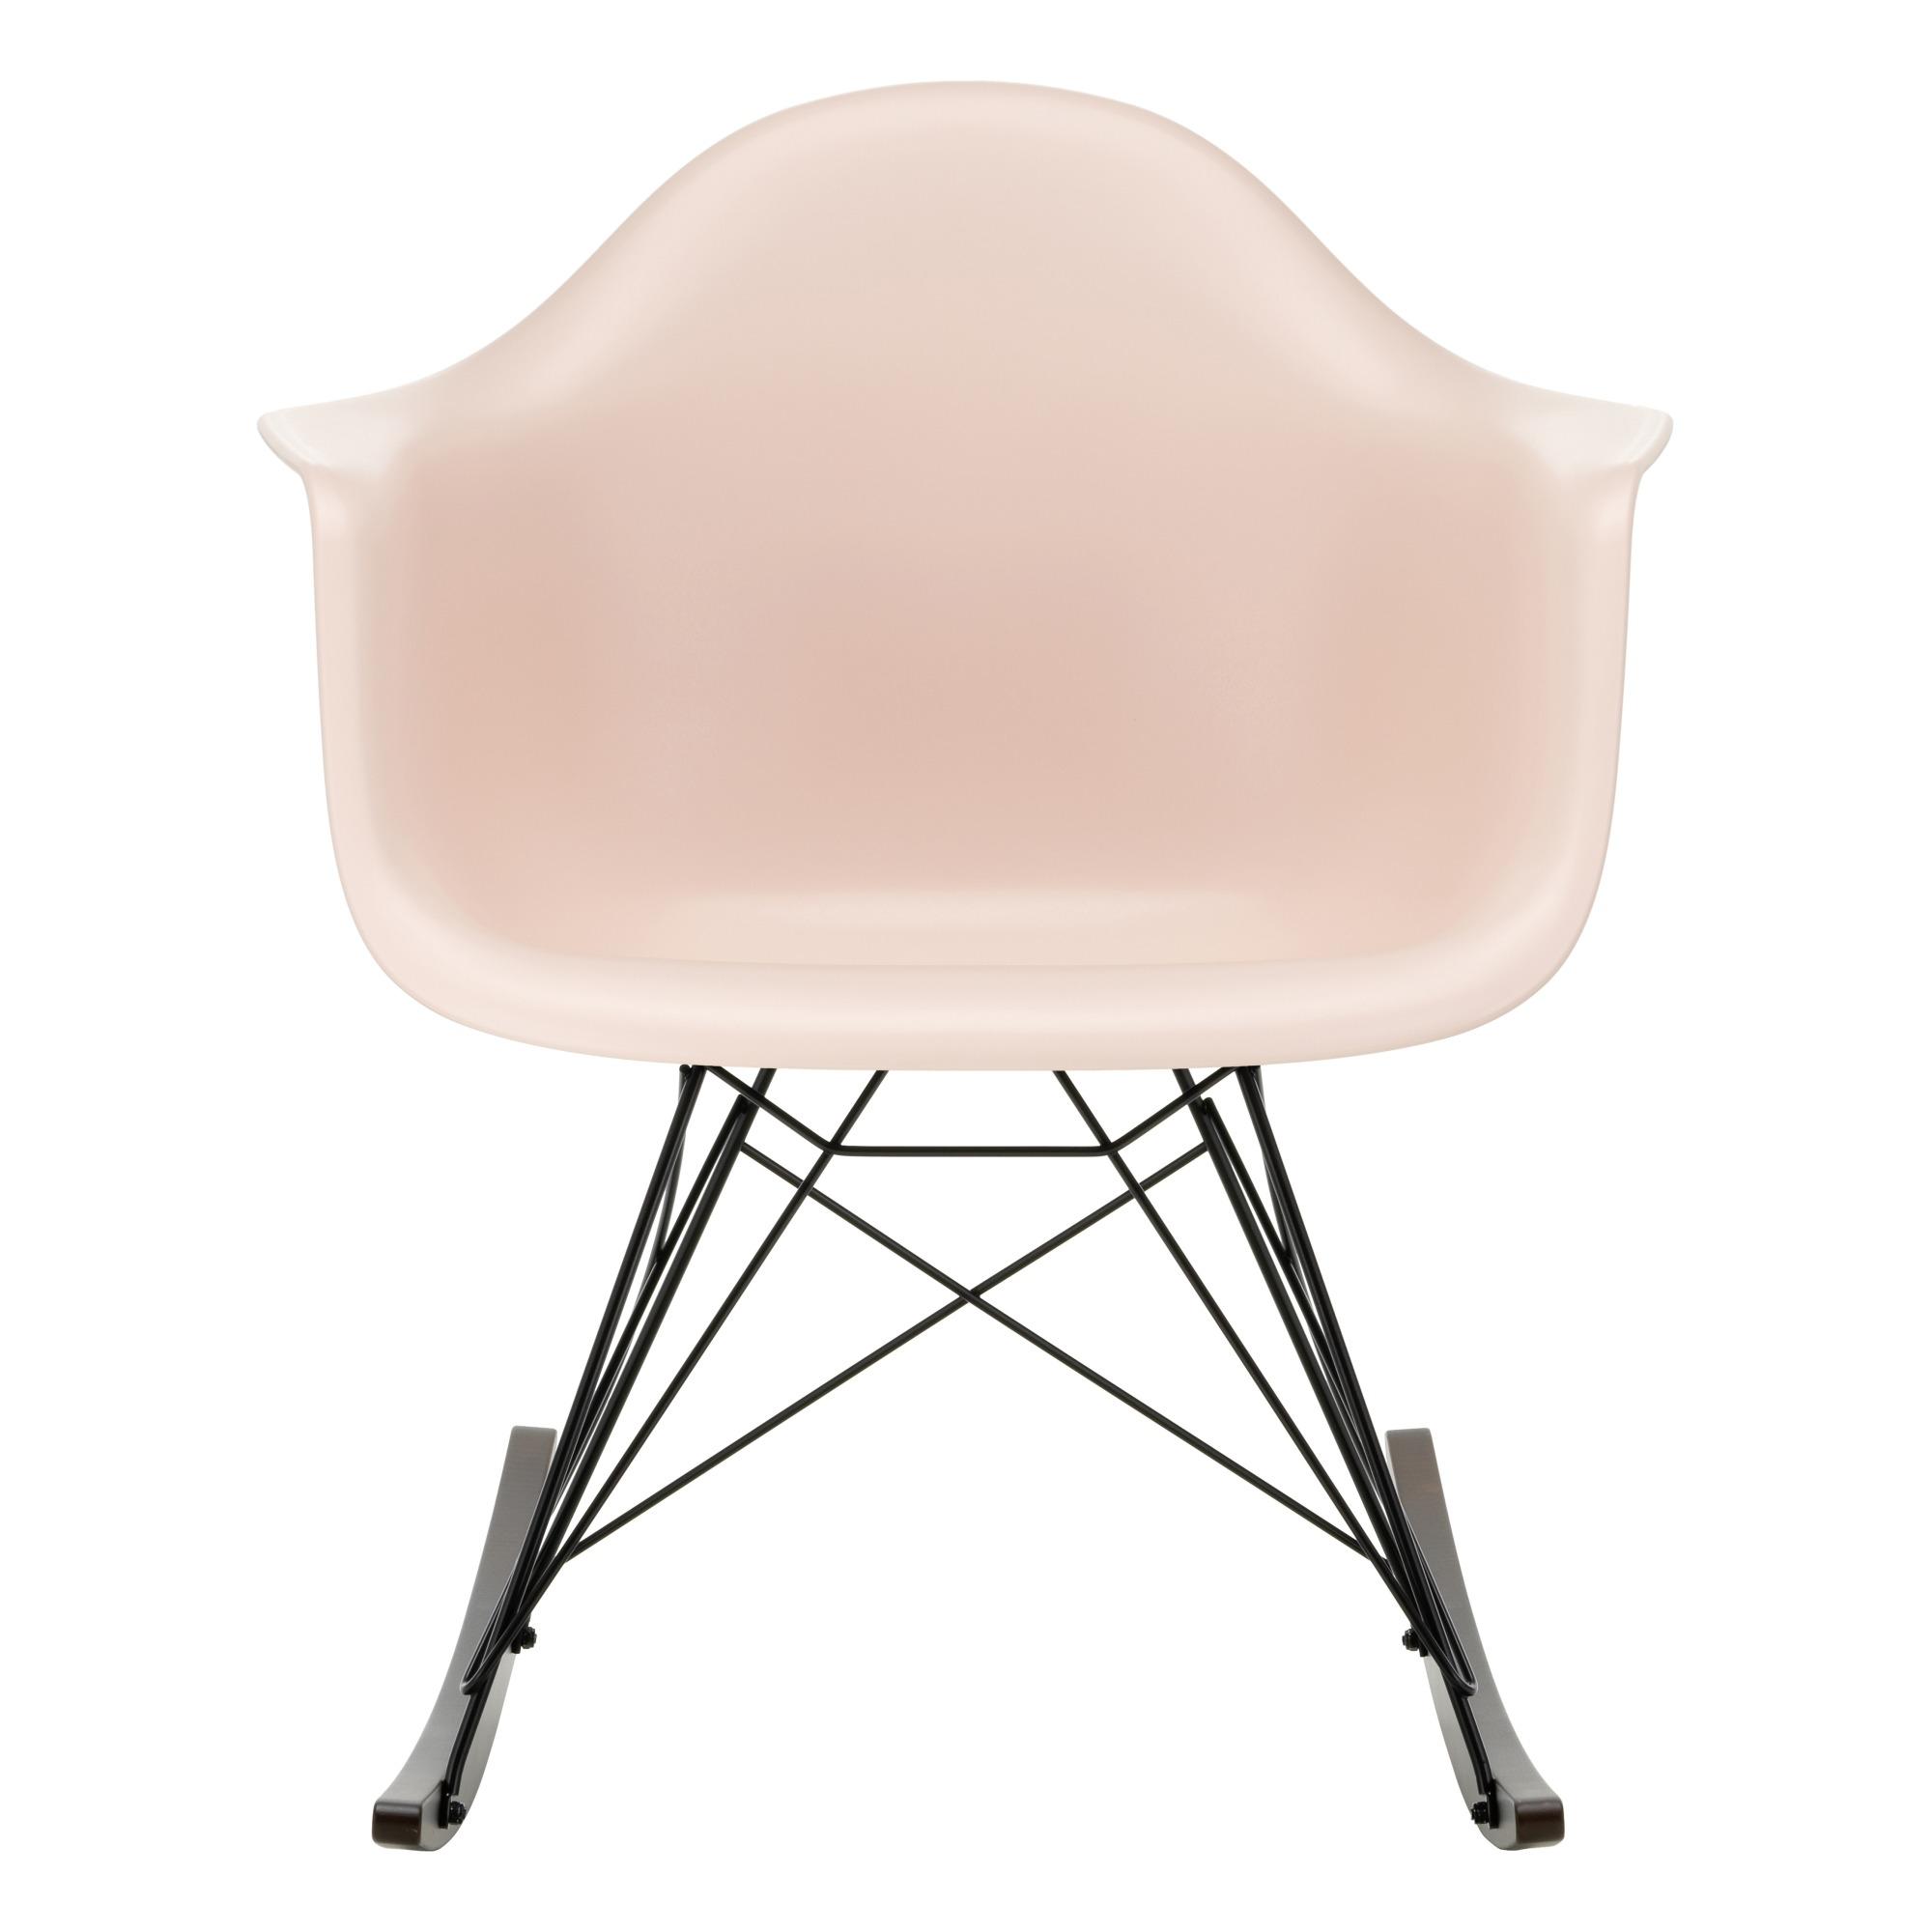 Sessel Eames Rar, Charles Ray Eames